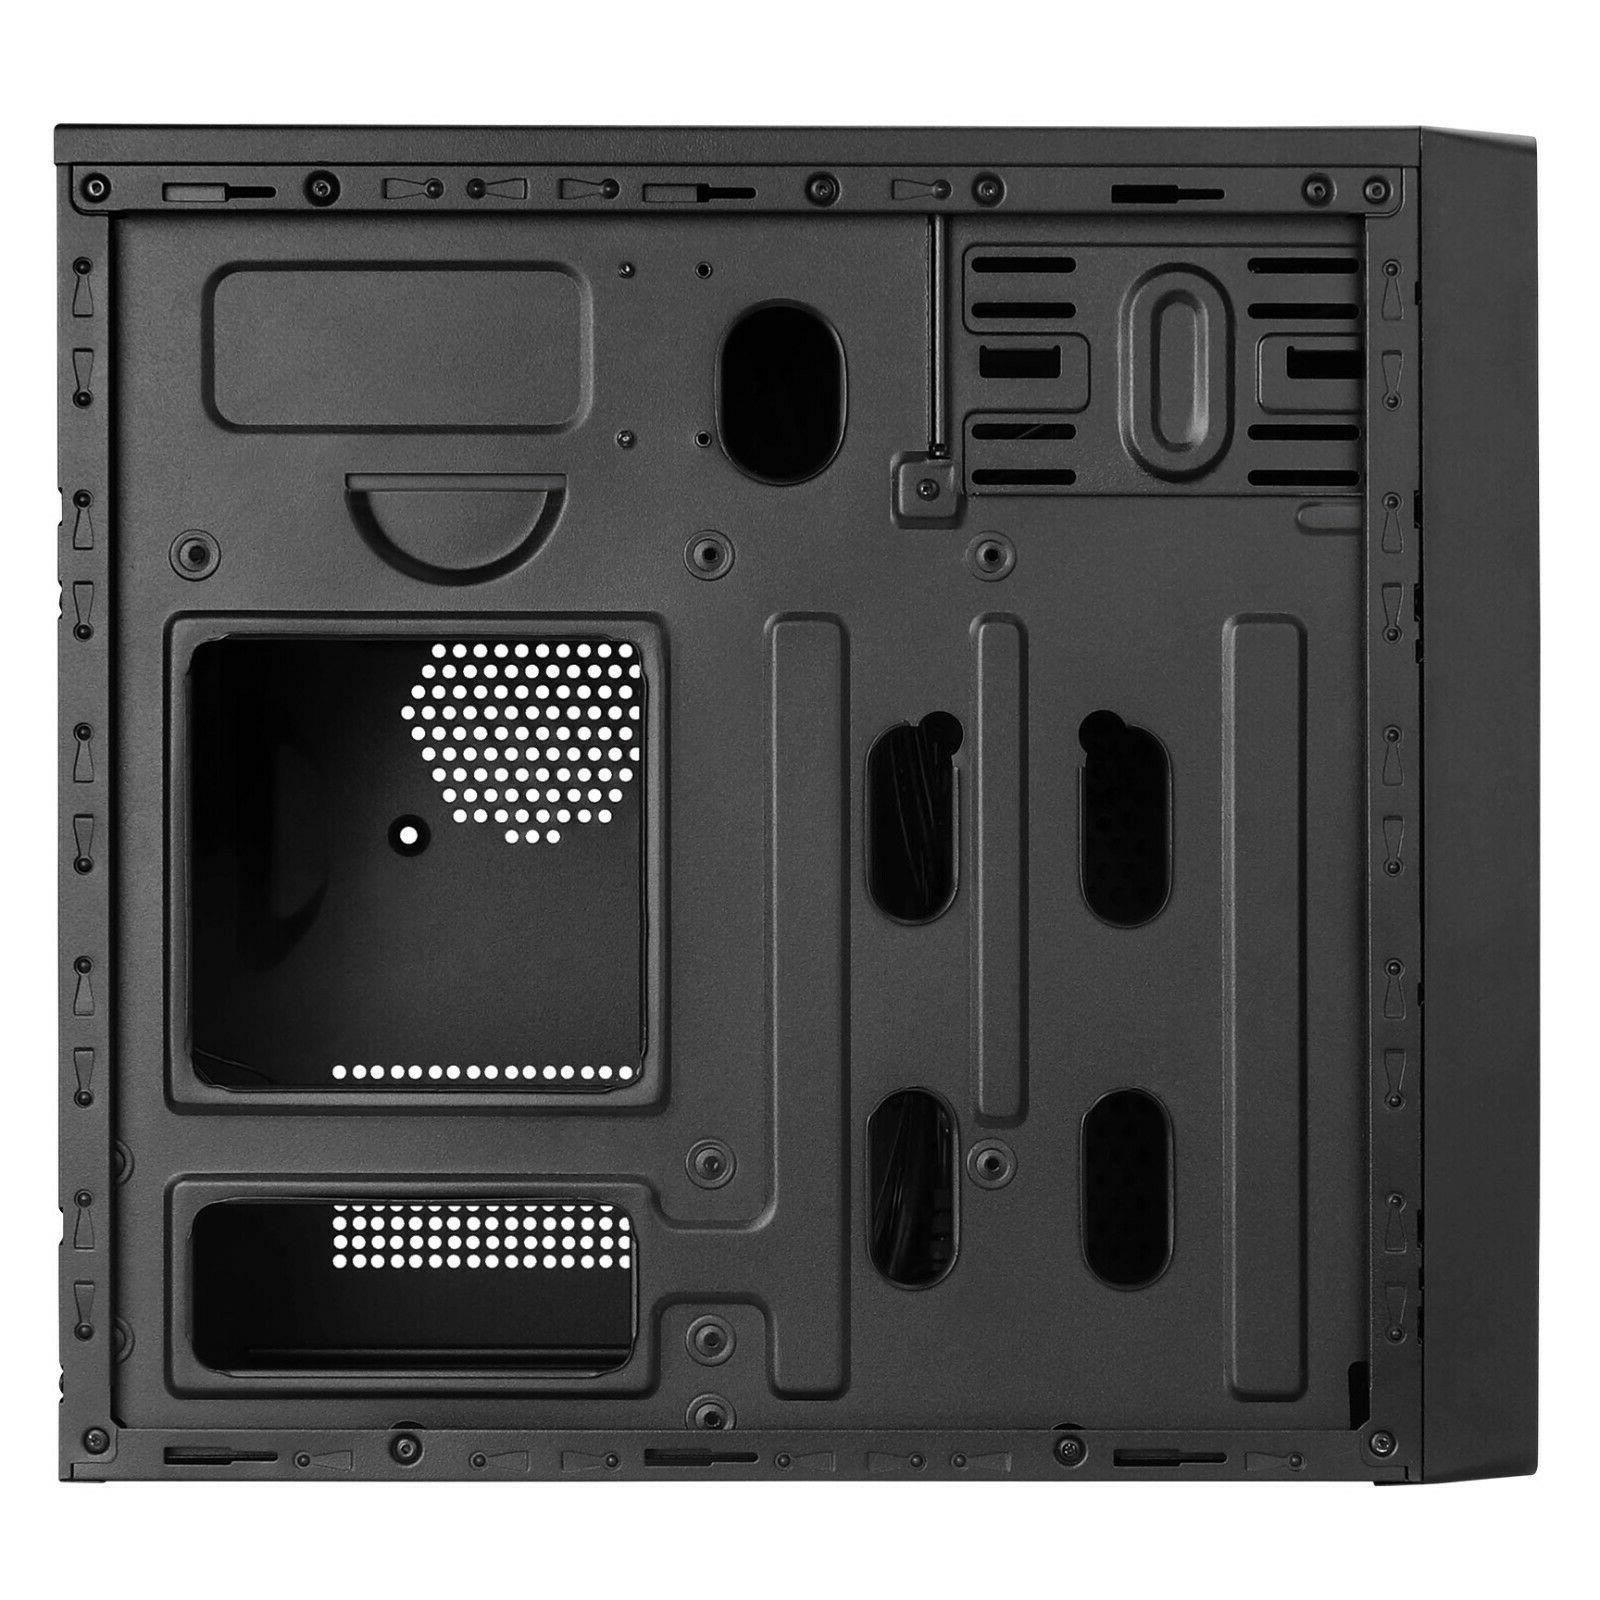 Rosewill Micro ATX Case Mini Tower PC USB 3.0